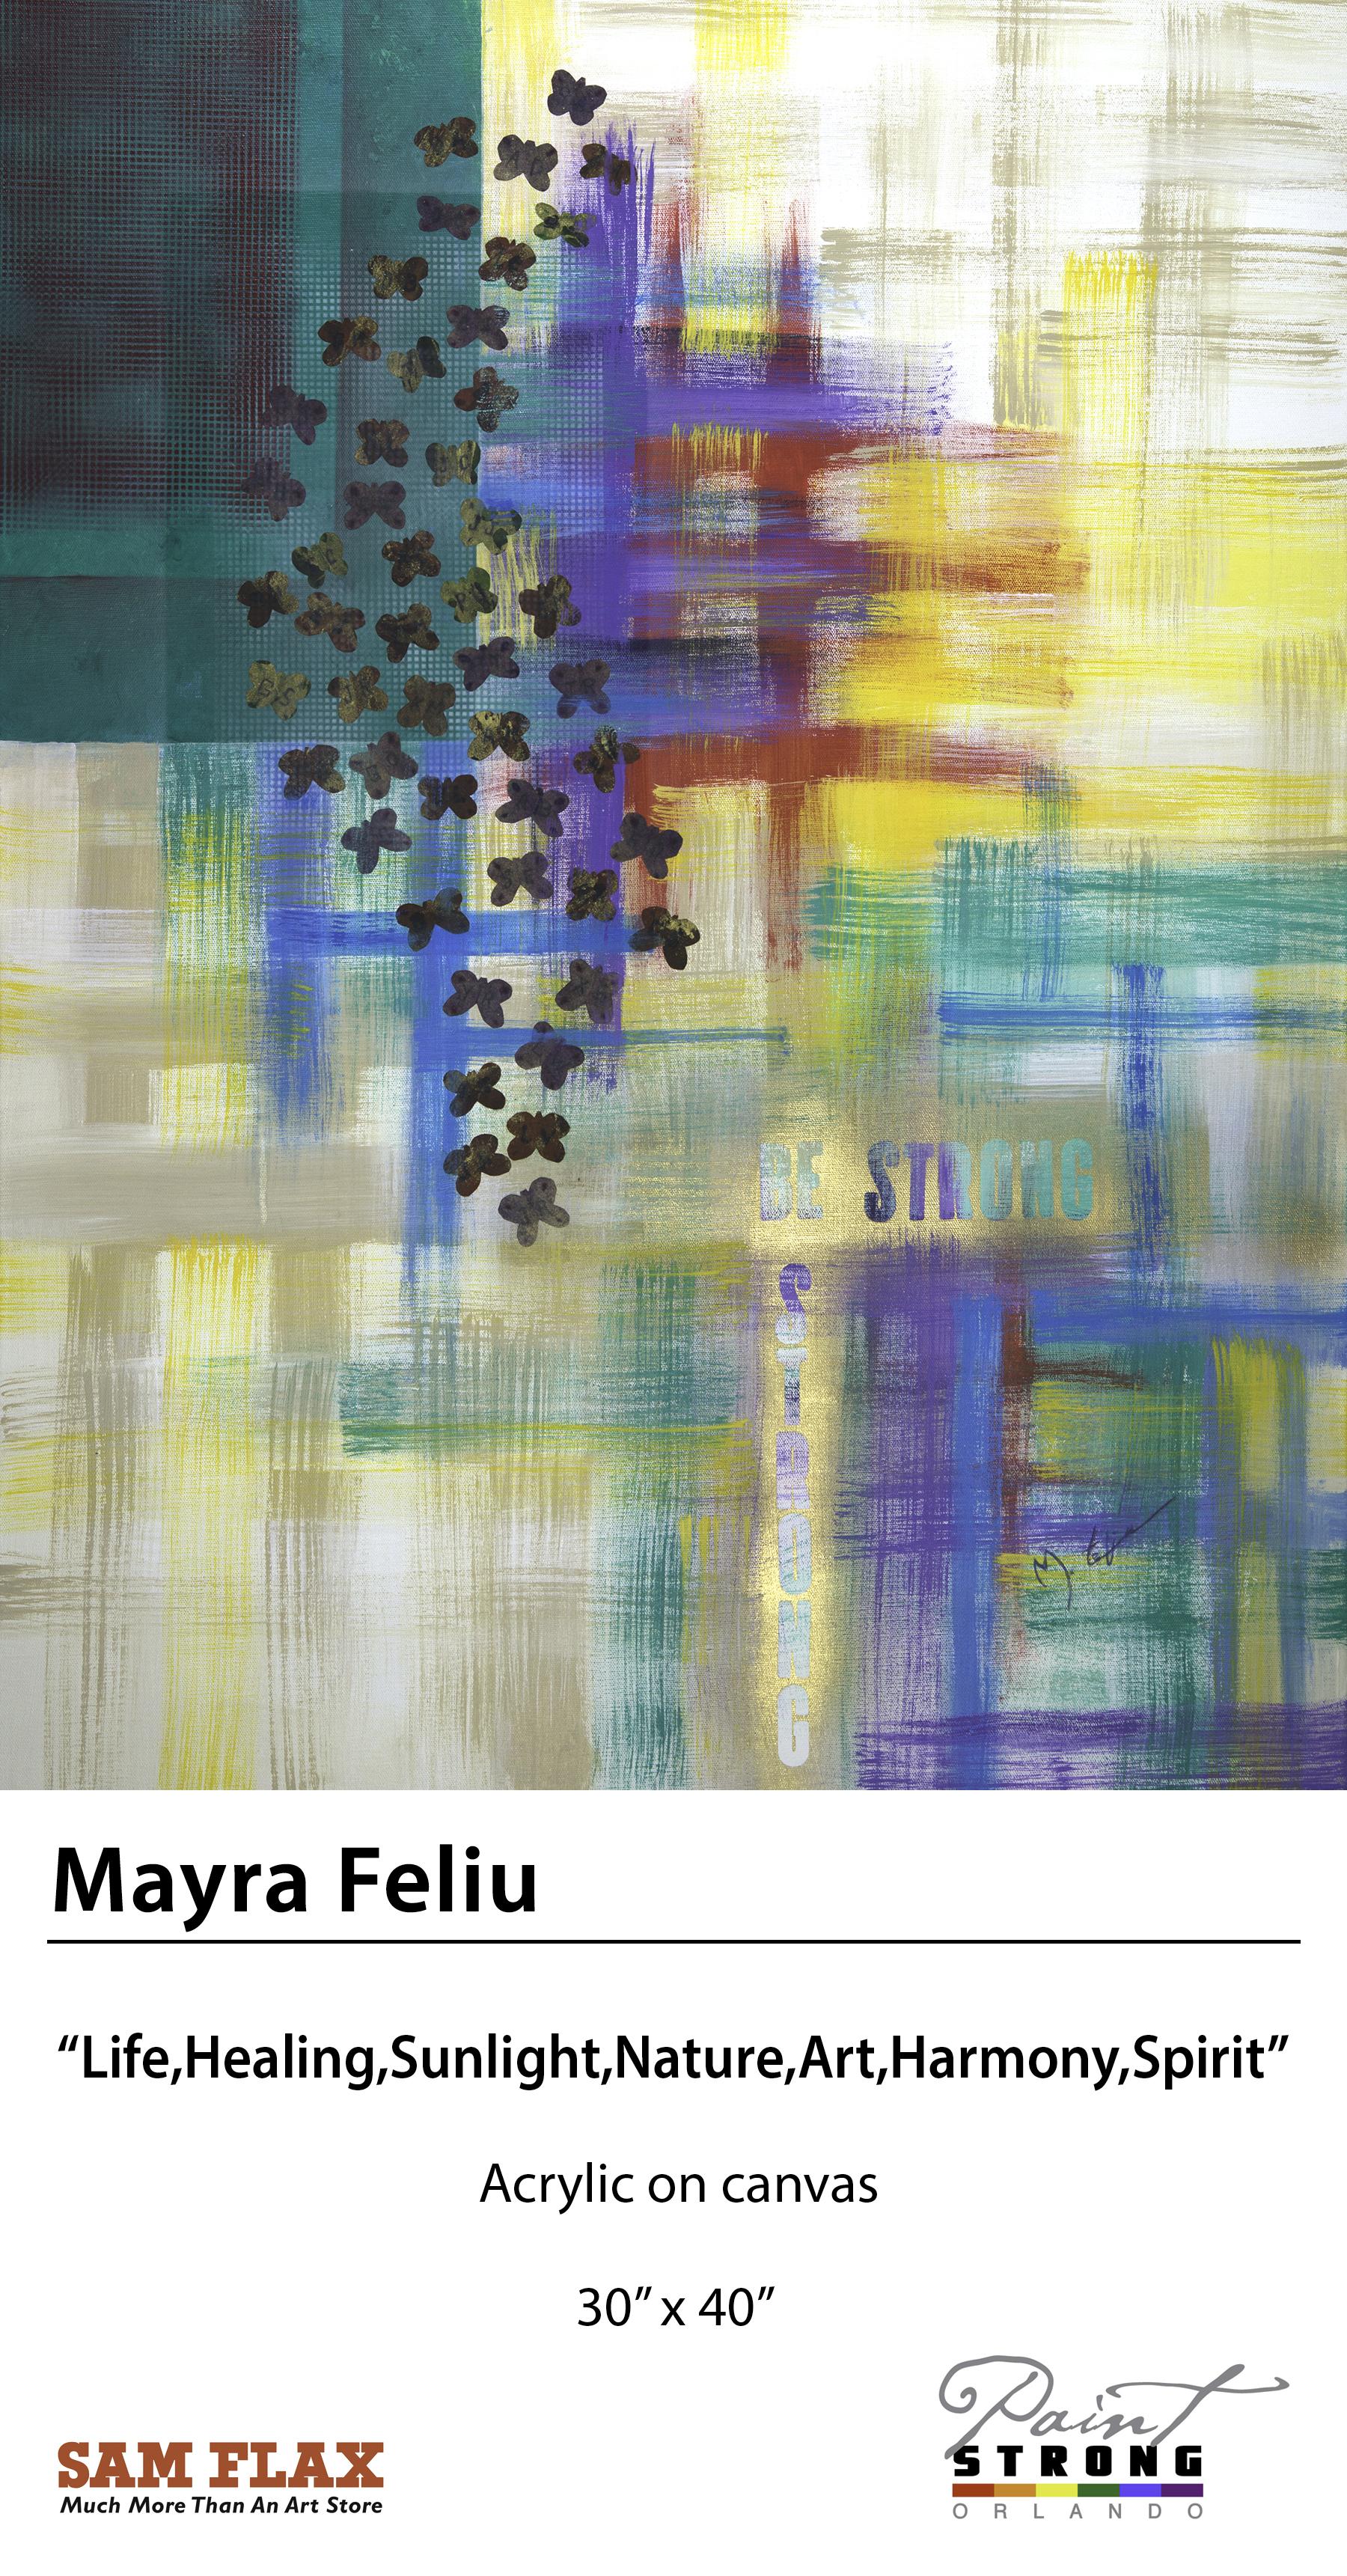 Mayra Feliu